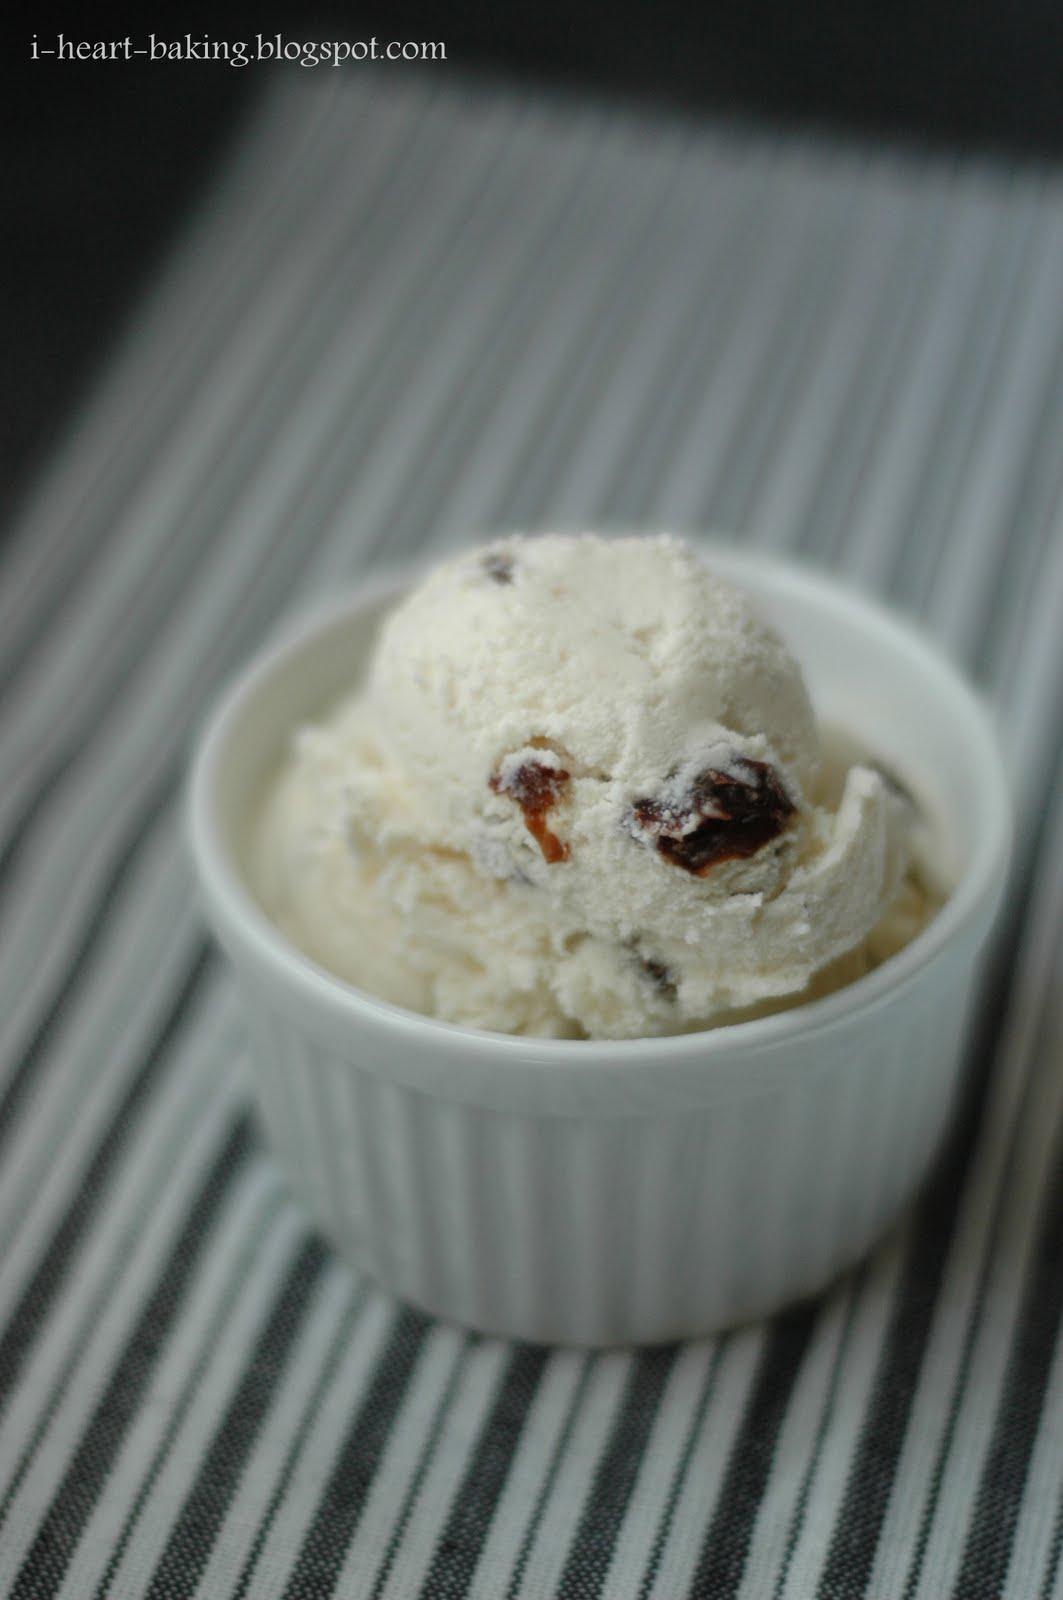 heart baking!: rum raisin ice cream